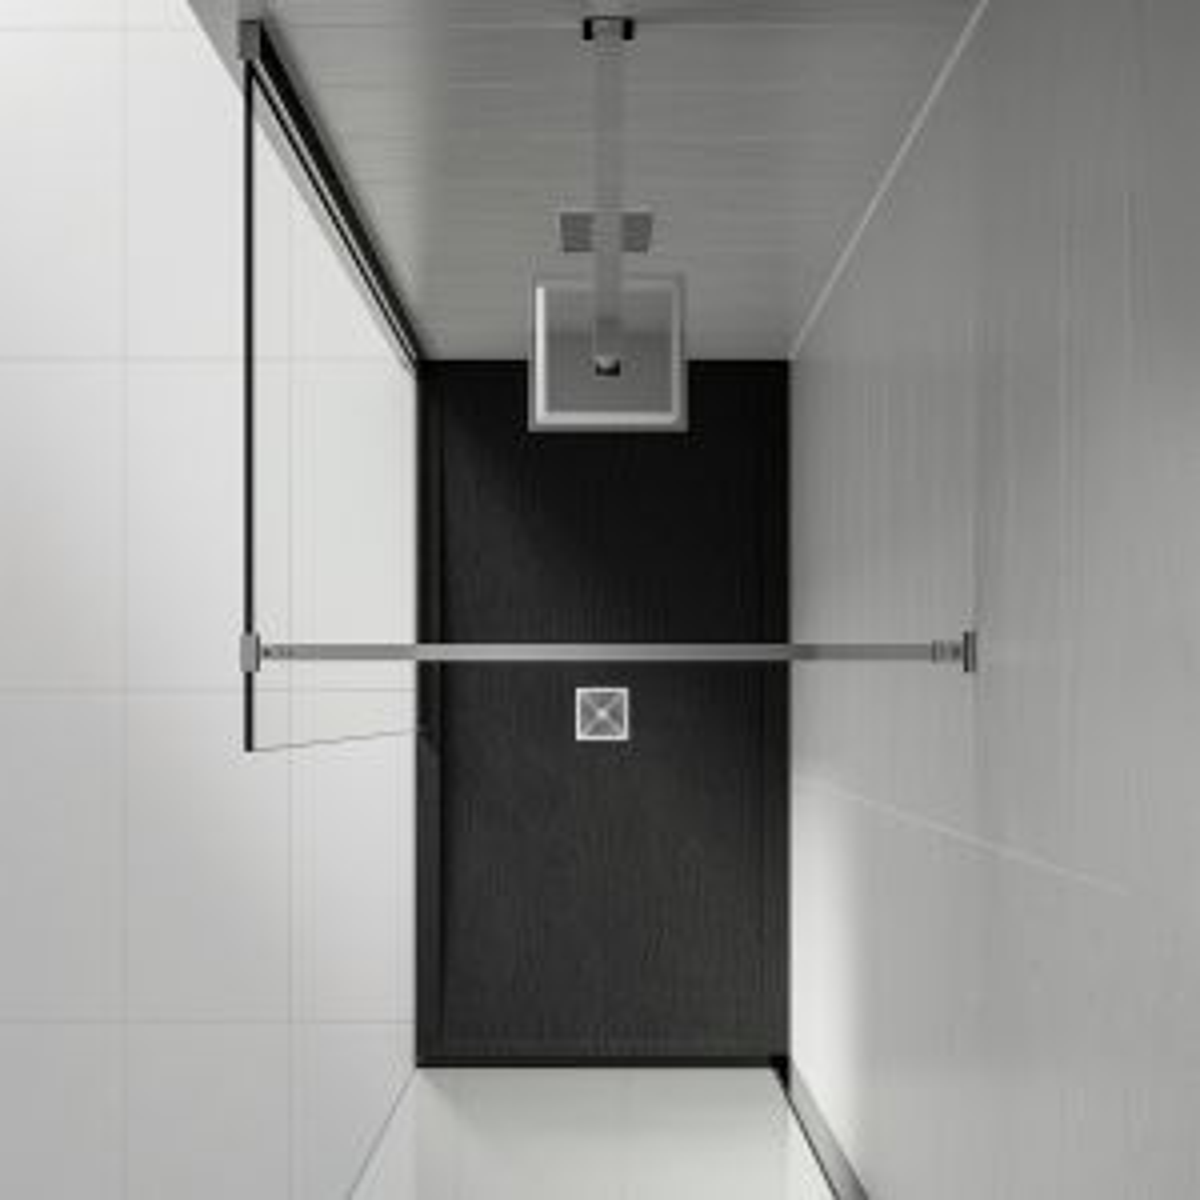 Aquadart Black Slate Shower Tray 1200 x 800 Overhead